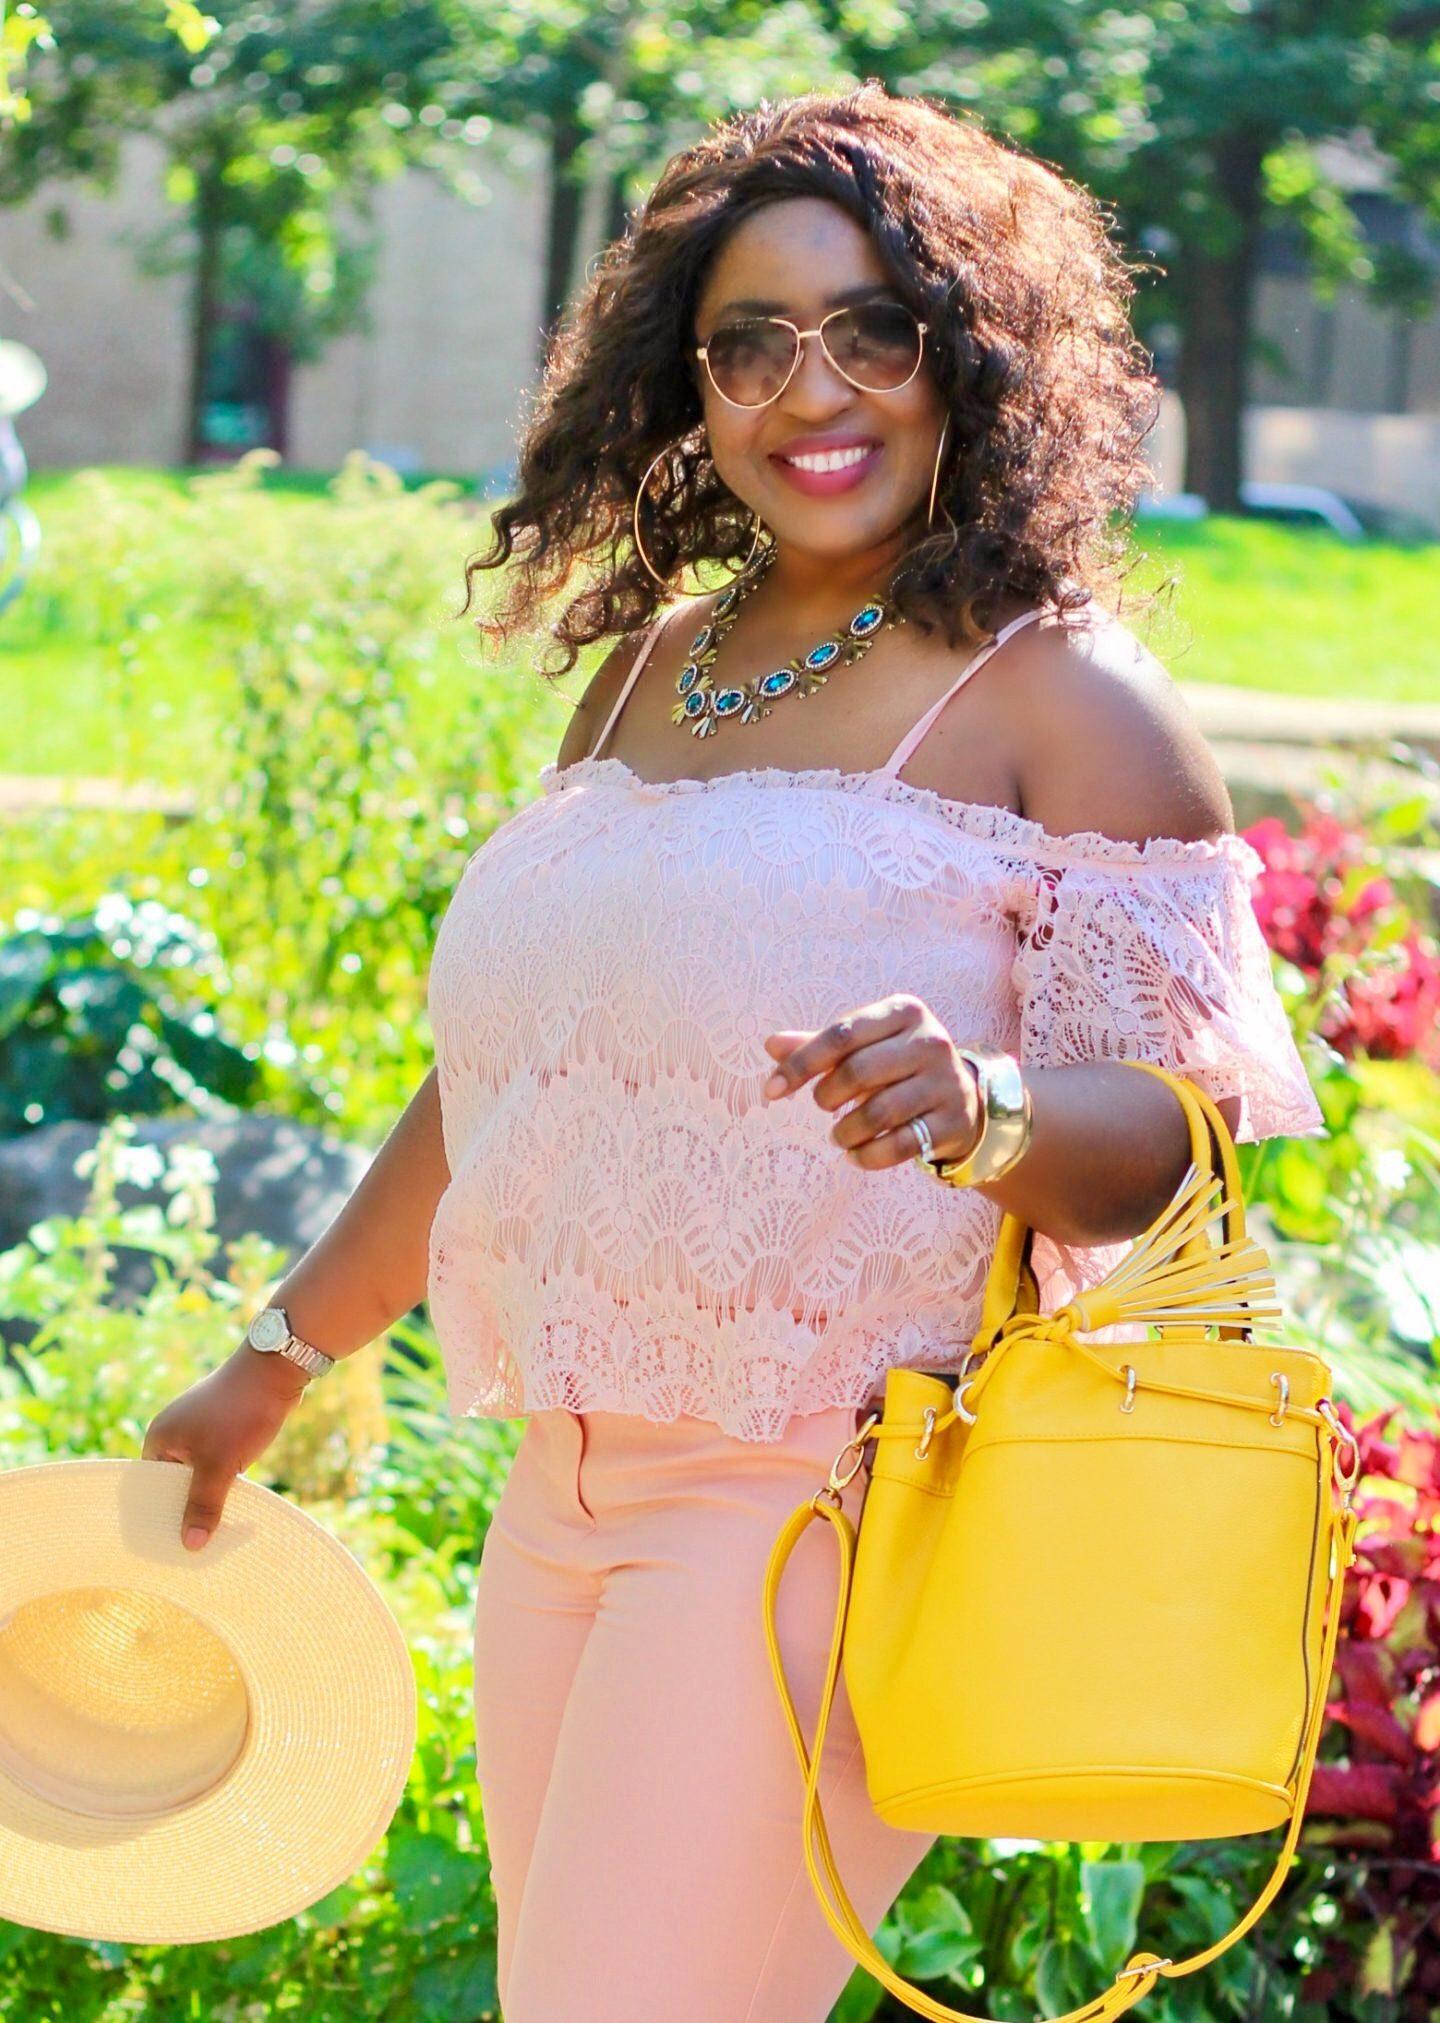 MInneapolis-top-fashion-blogers